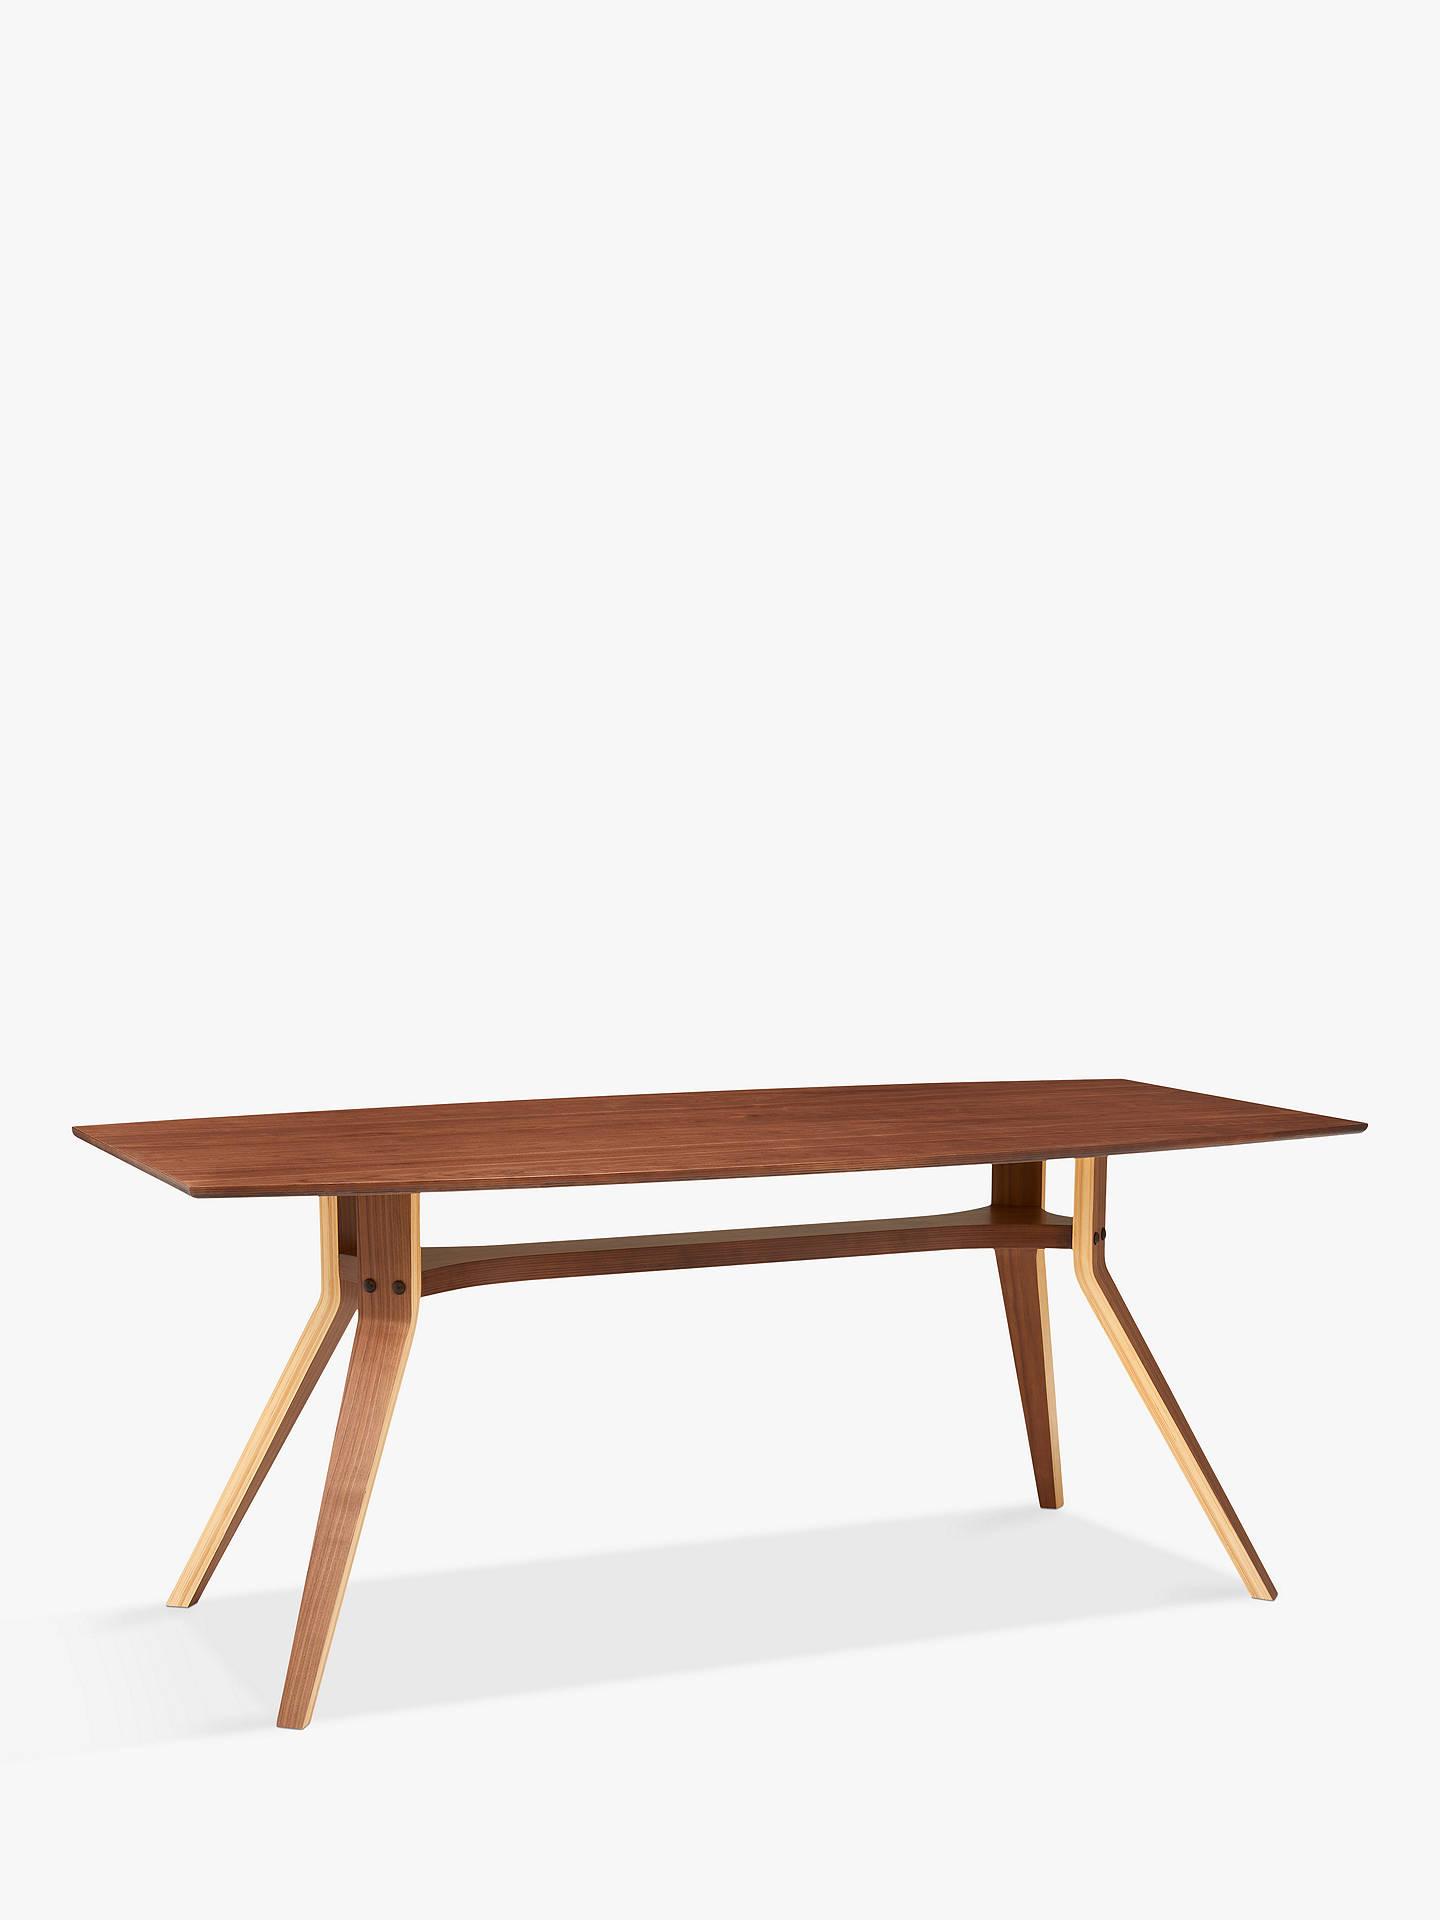 Wondrous John Lewis Partners Radar 8 Seater Dining Table Walnut Creativecarmelina Interior Chair Design Creativecarmelinacom